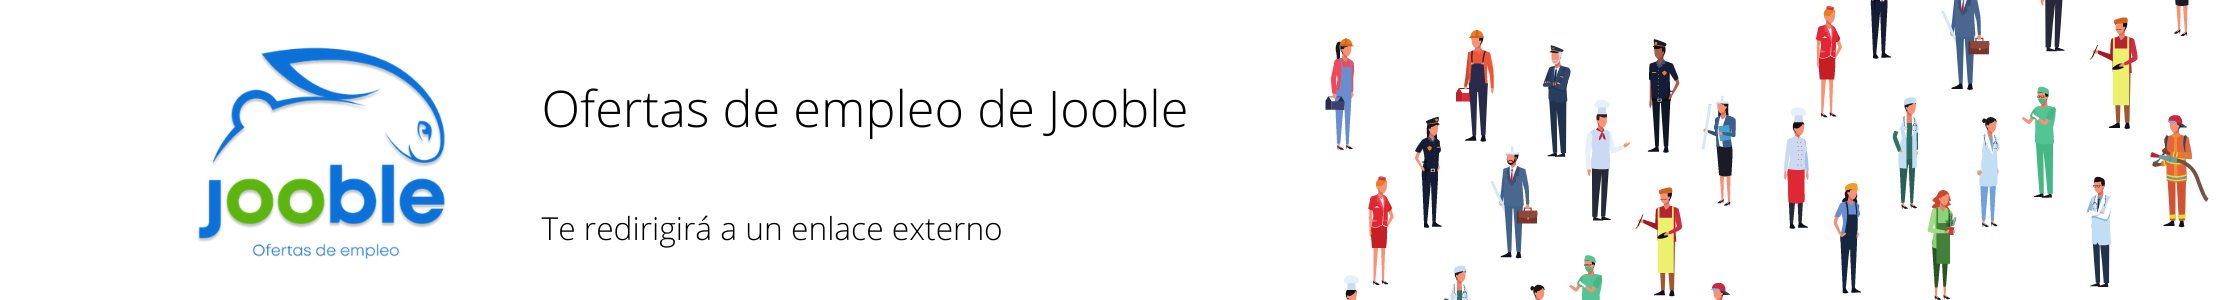 Ofertas de empleo de Jooble - Vitalis